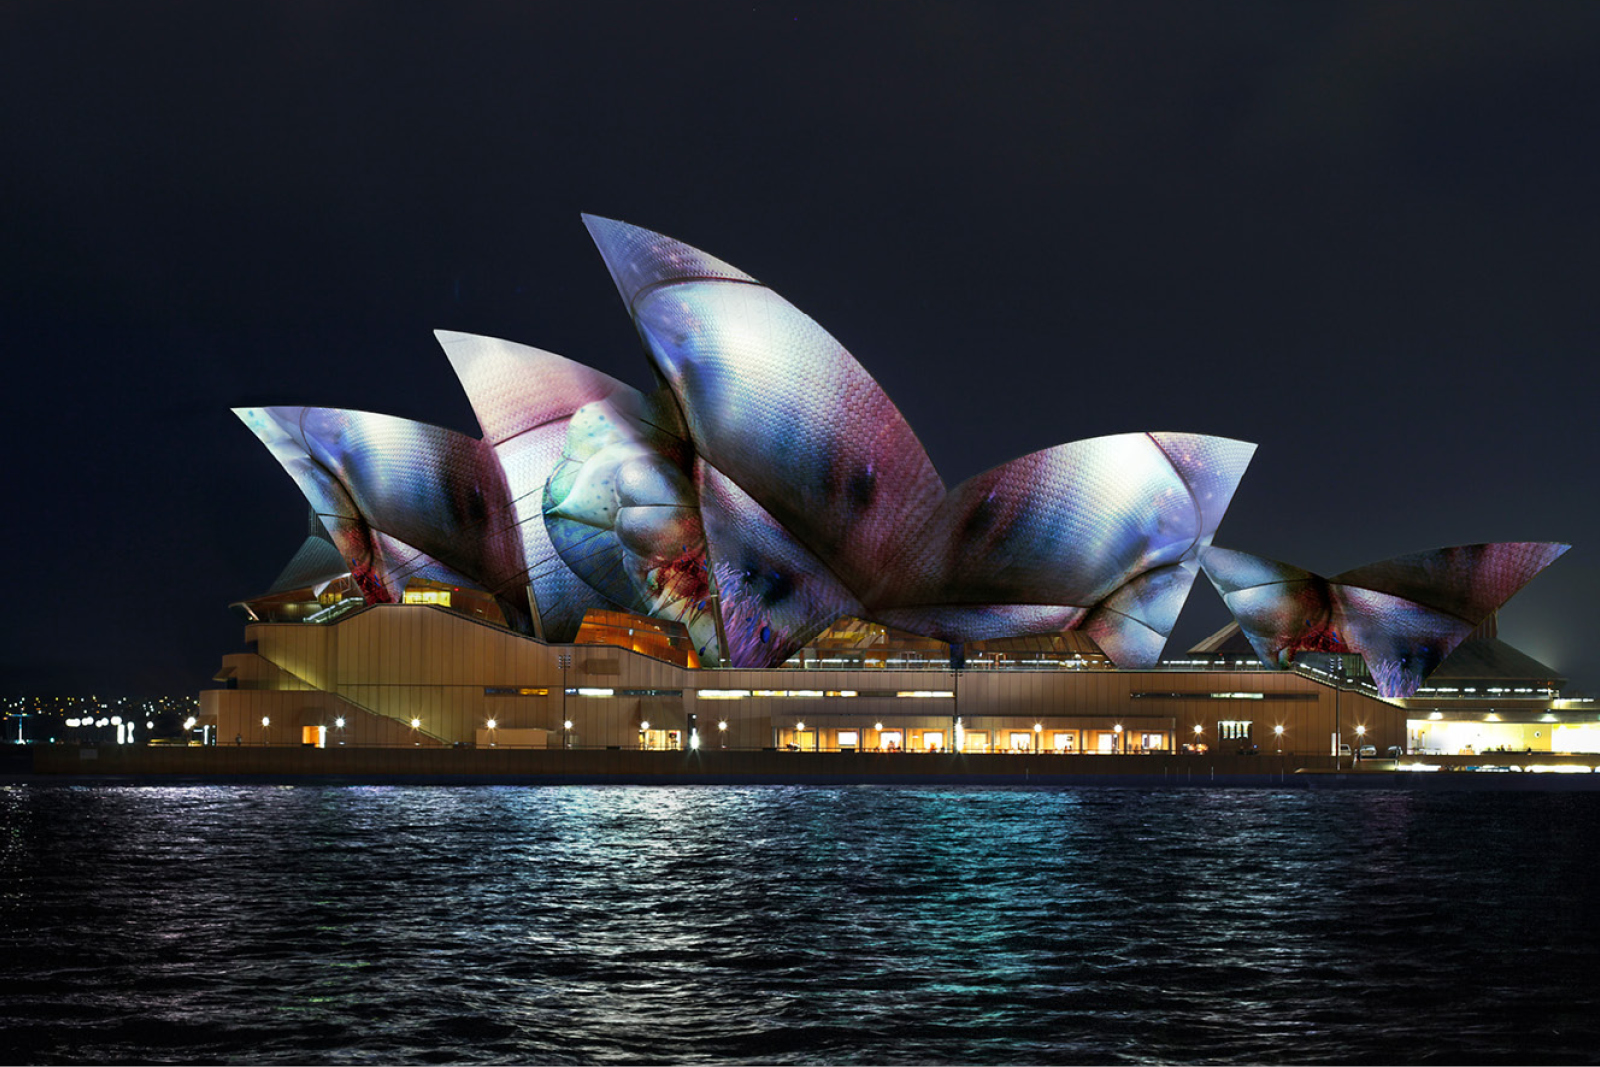 Sydney Opera House Vivid Live 17 - Lighting Sails